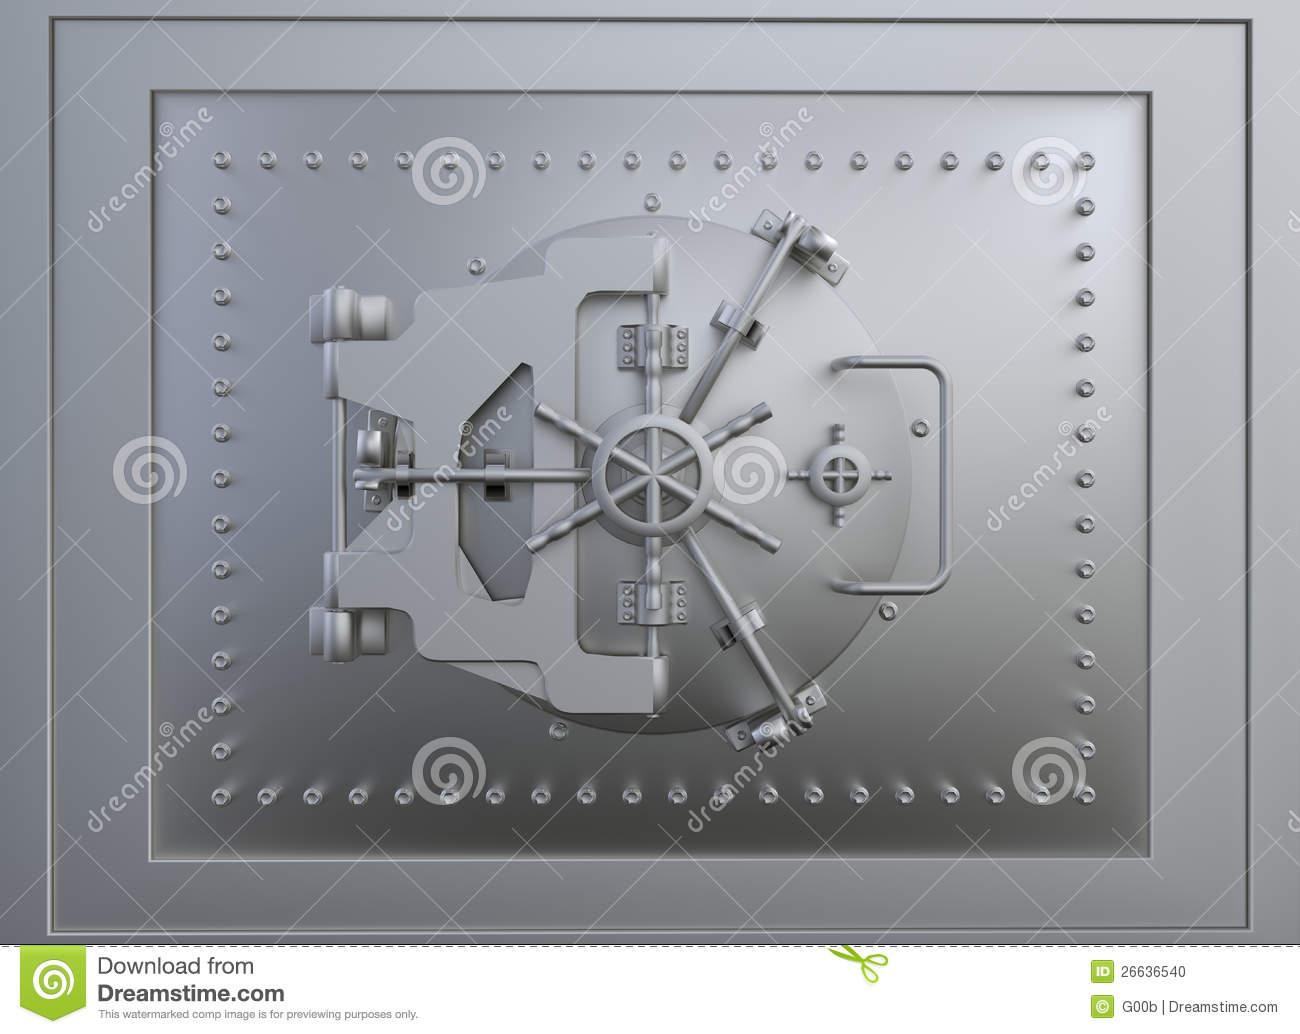 Vault door clipart clipart transparent Front View Of A Vault Door Stock Photo - Image: 26636540 clipart transparent